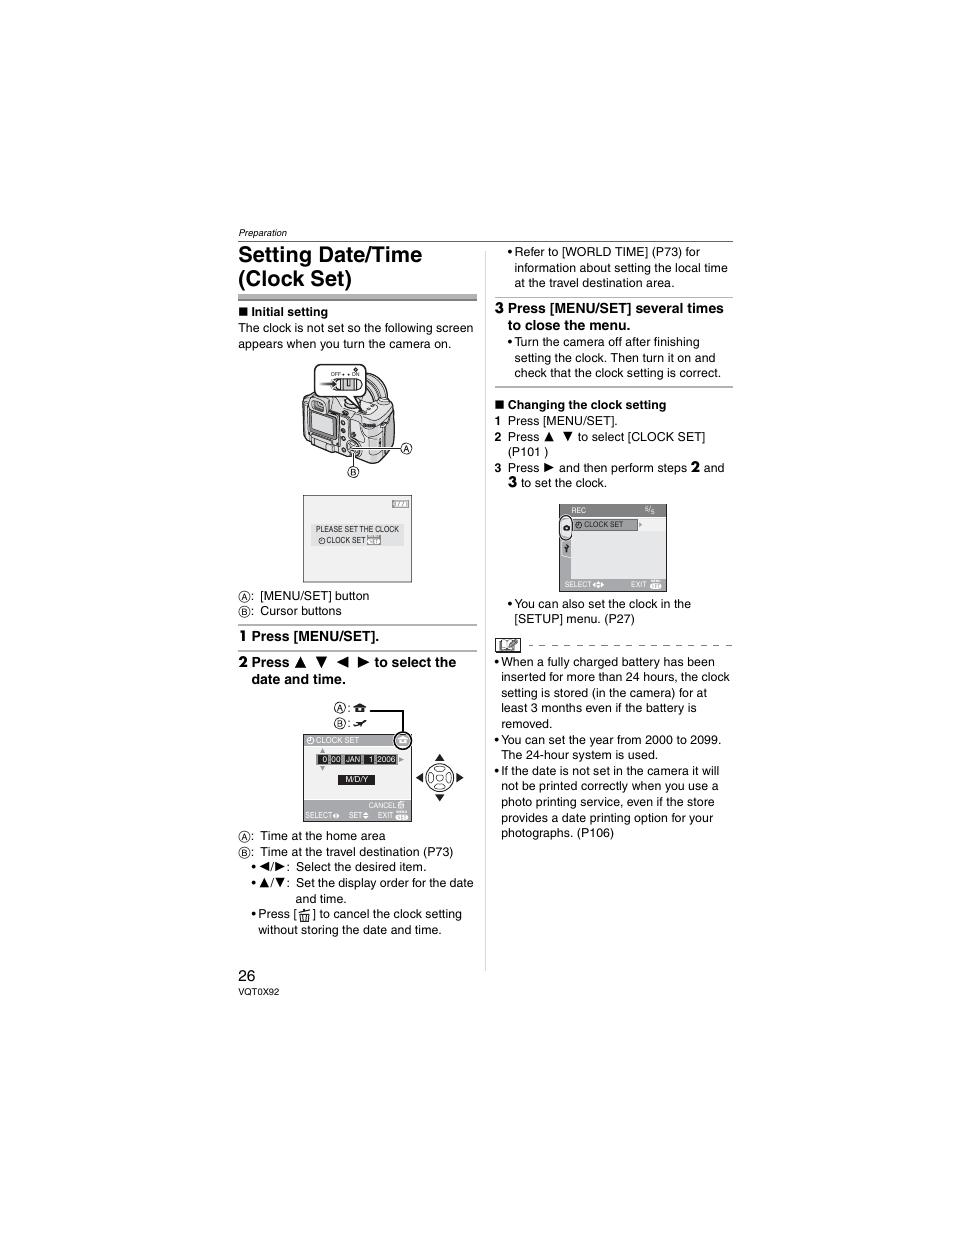 Setting date/time (clock set), 3 press [menu/set] several